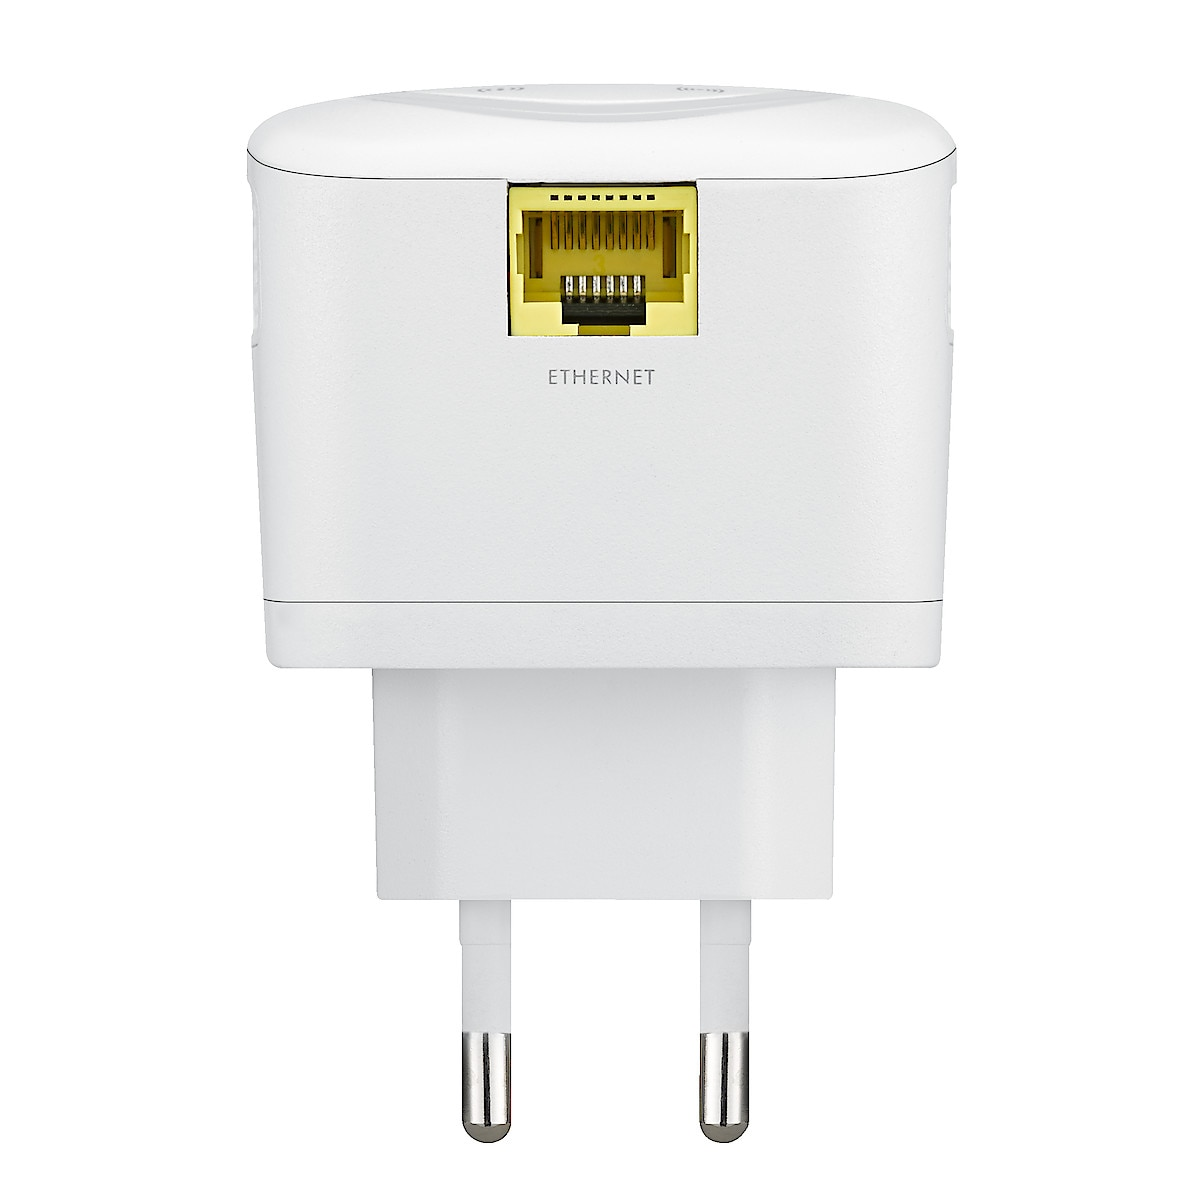 Exibel WRE6505 V2 AC-WiFi-repeater